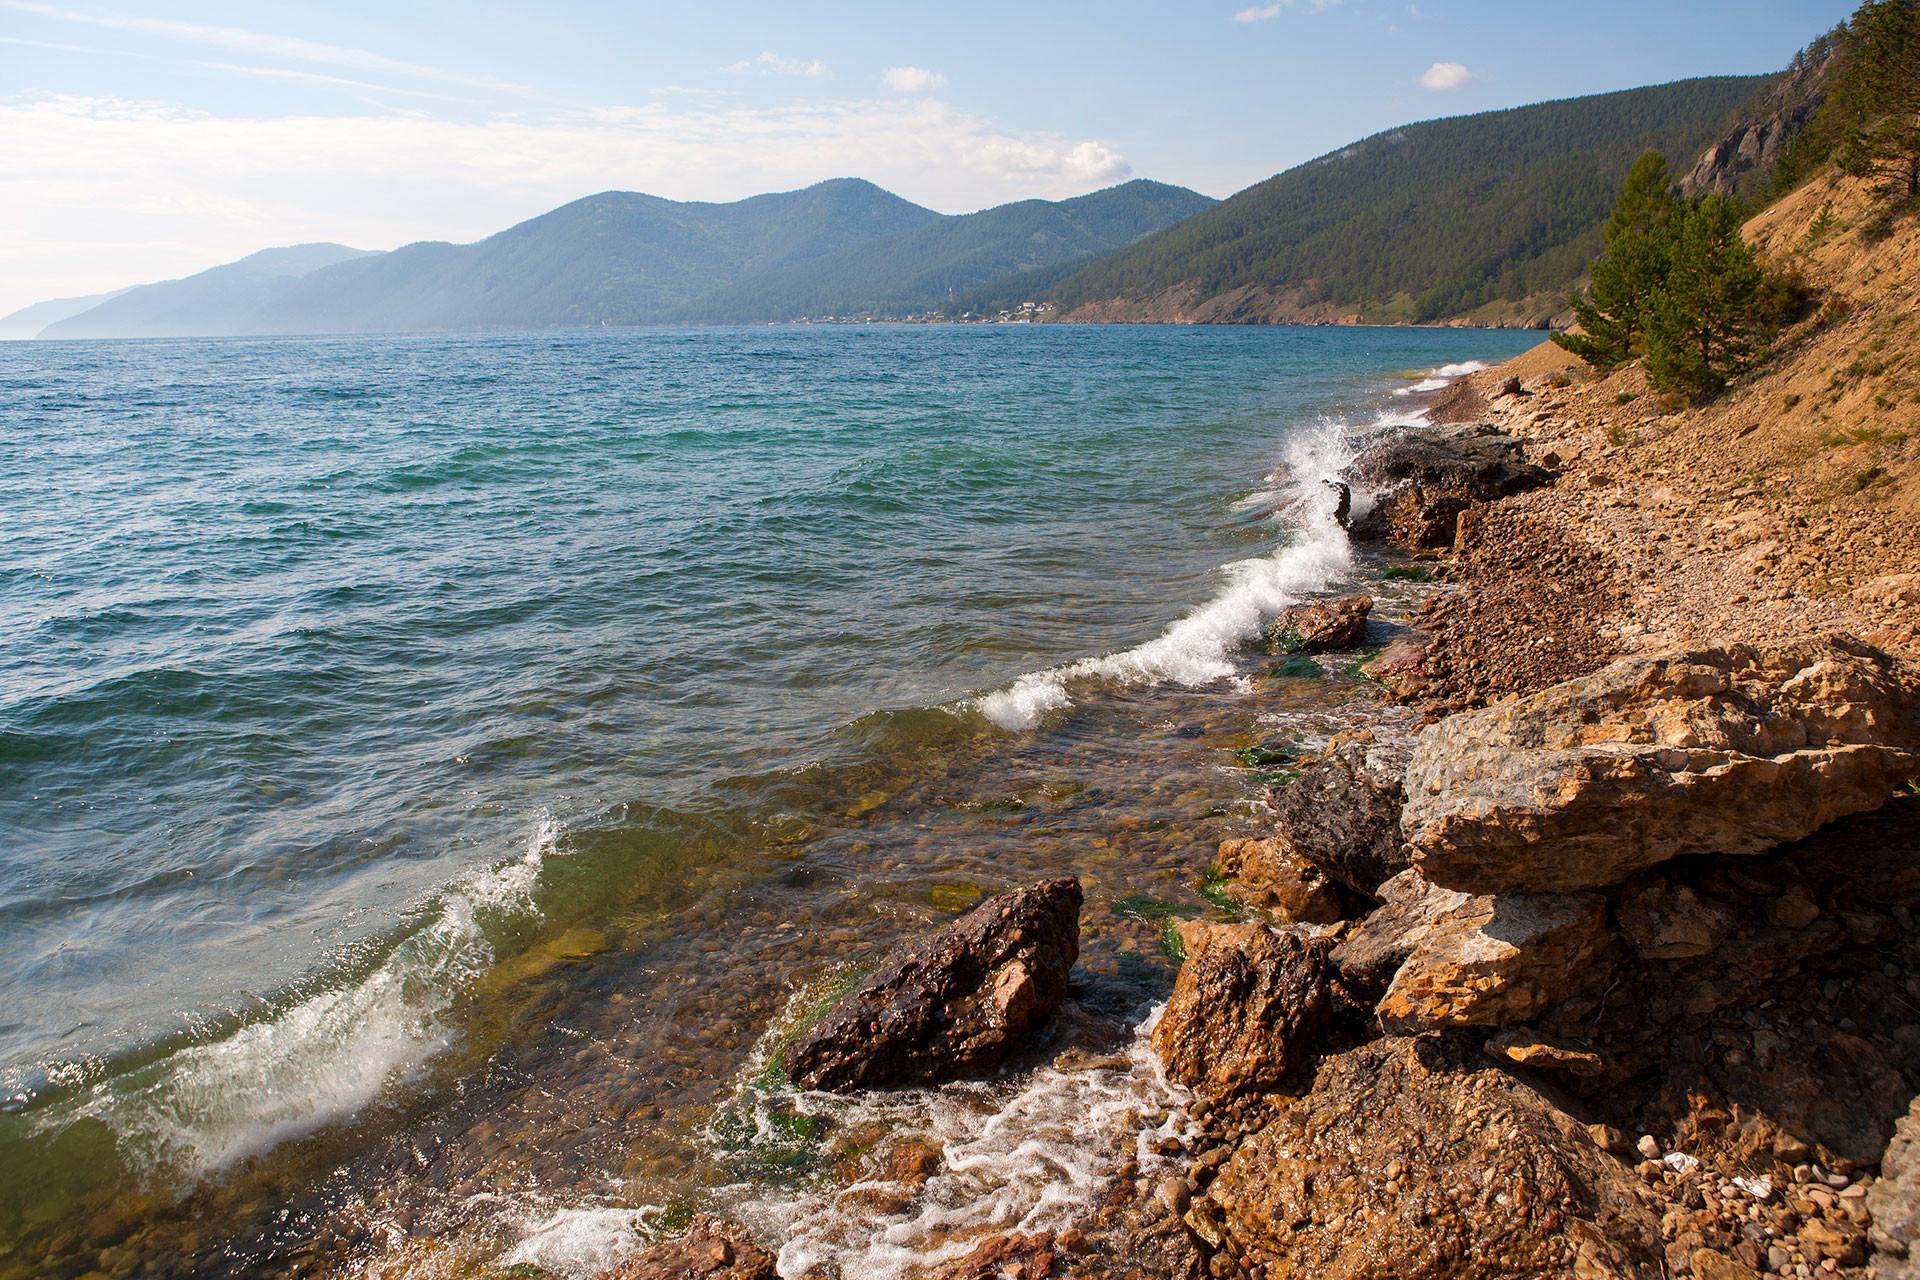 Le coste del Bajkal